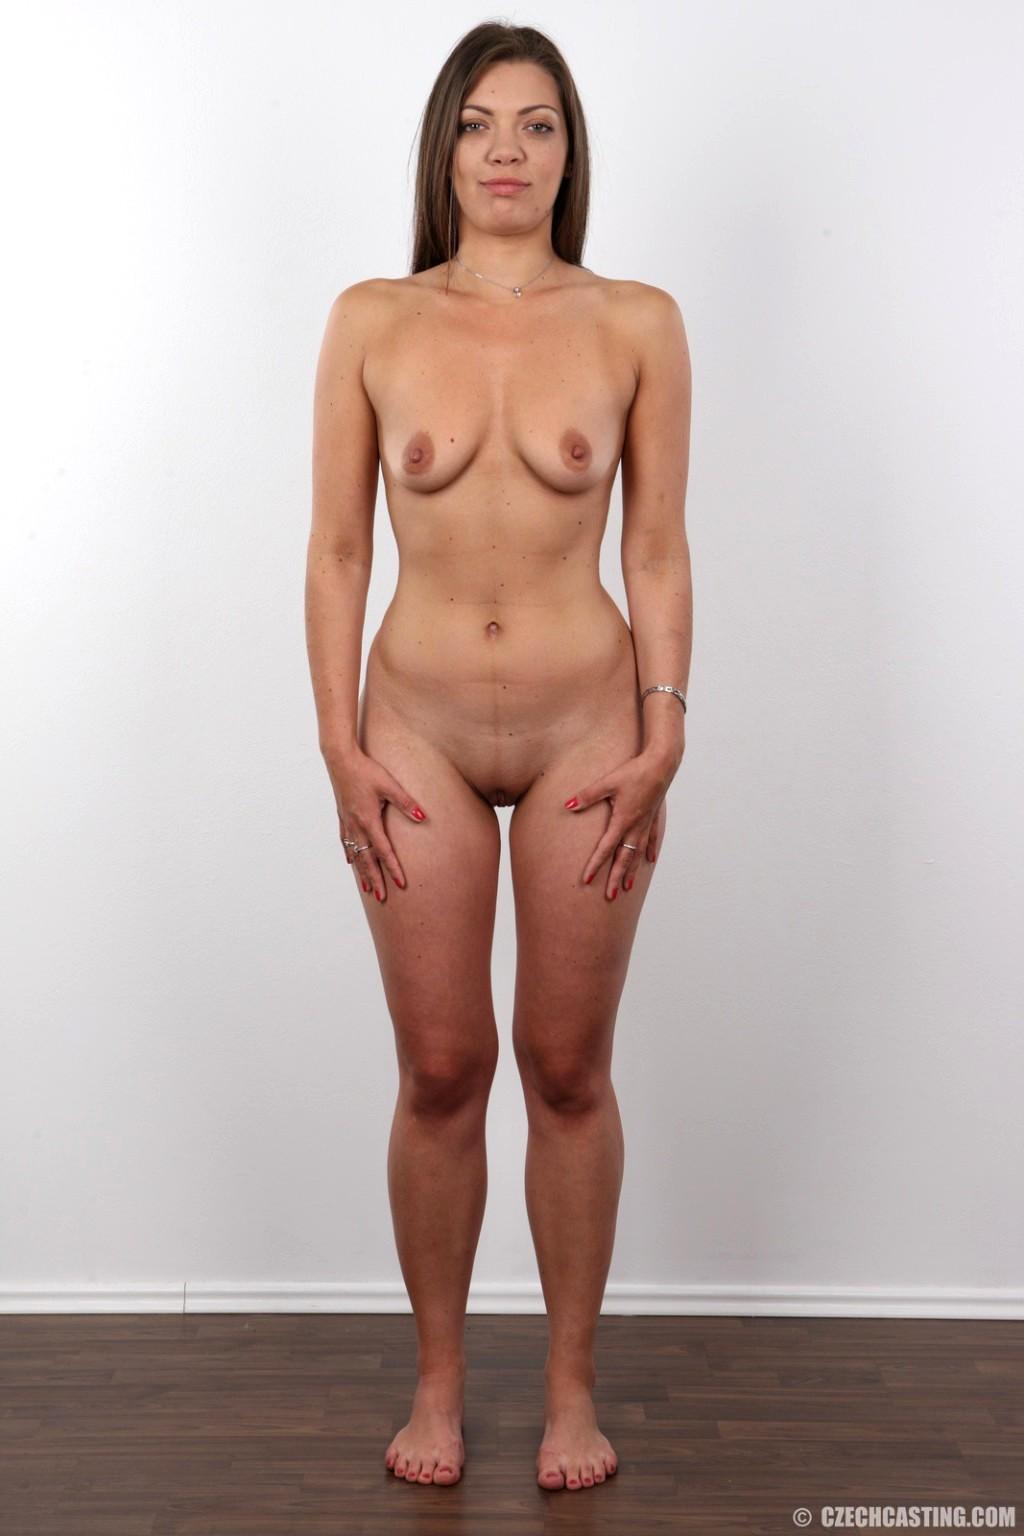 bdsm-porn-soccer-mom-casting-nude-video